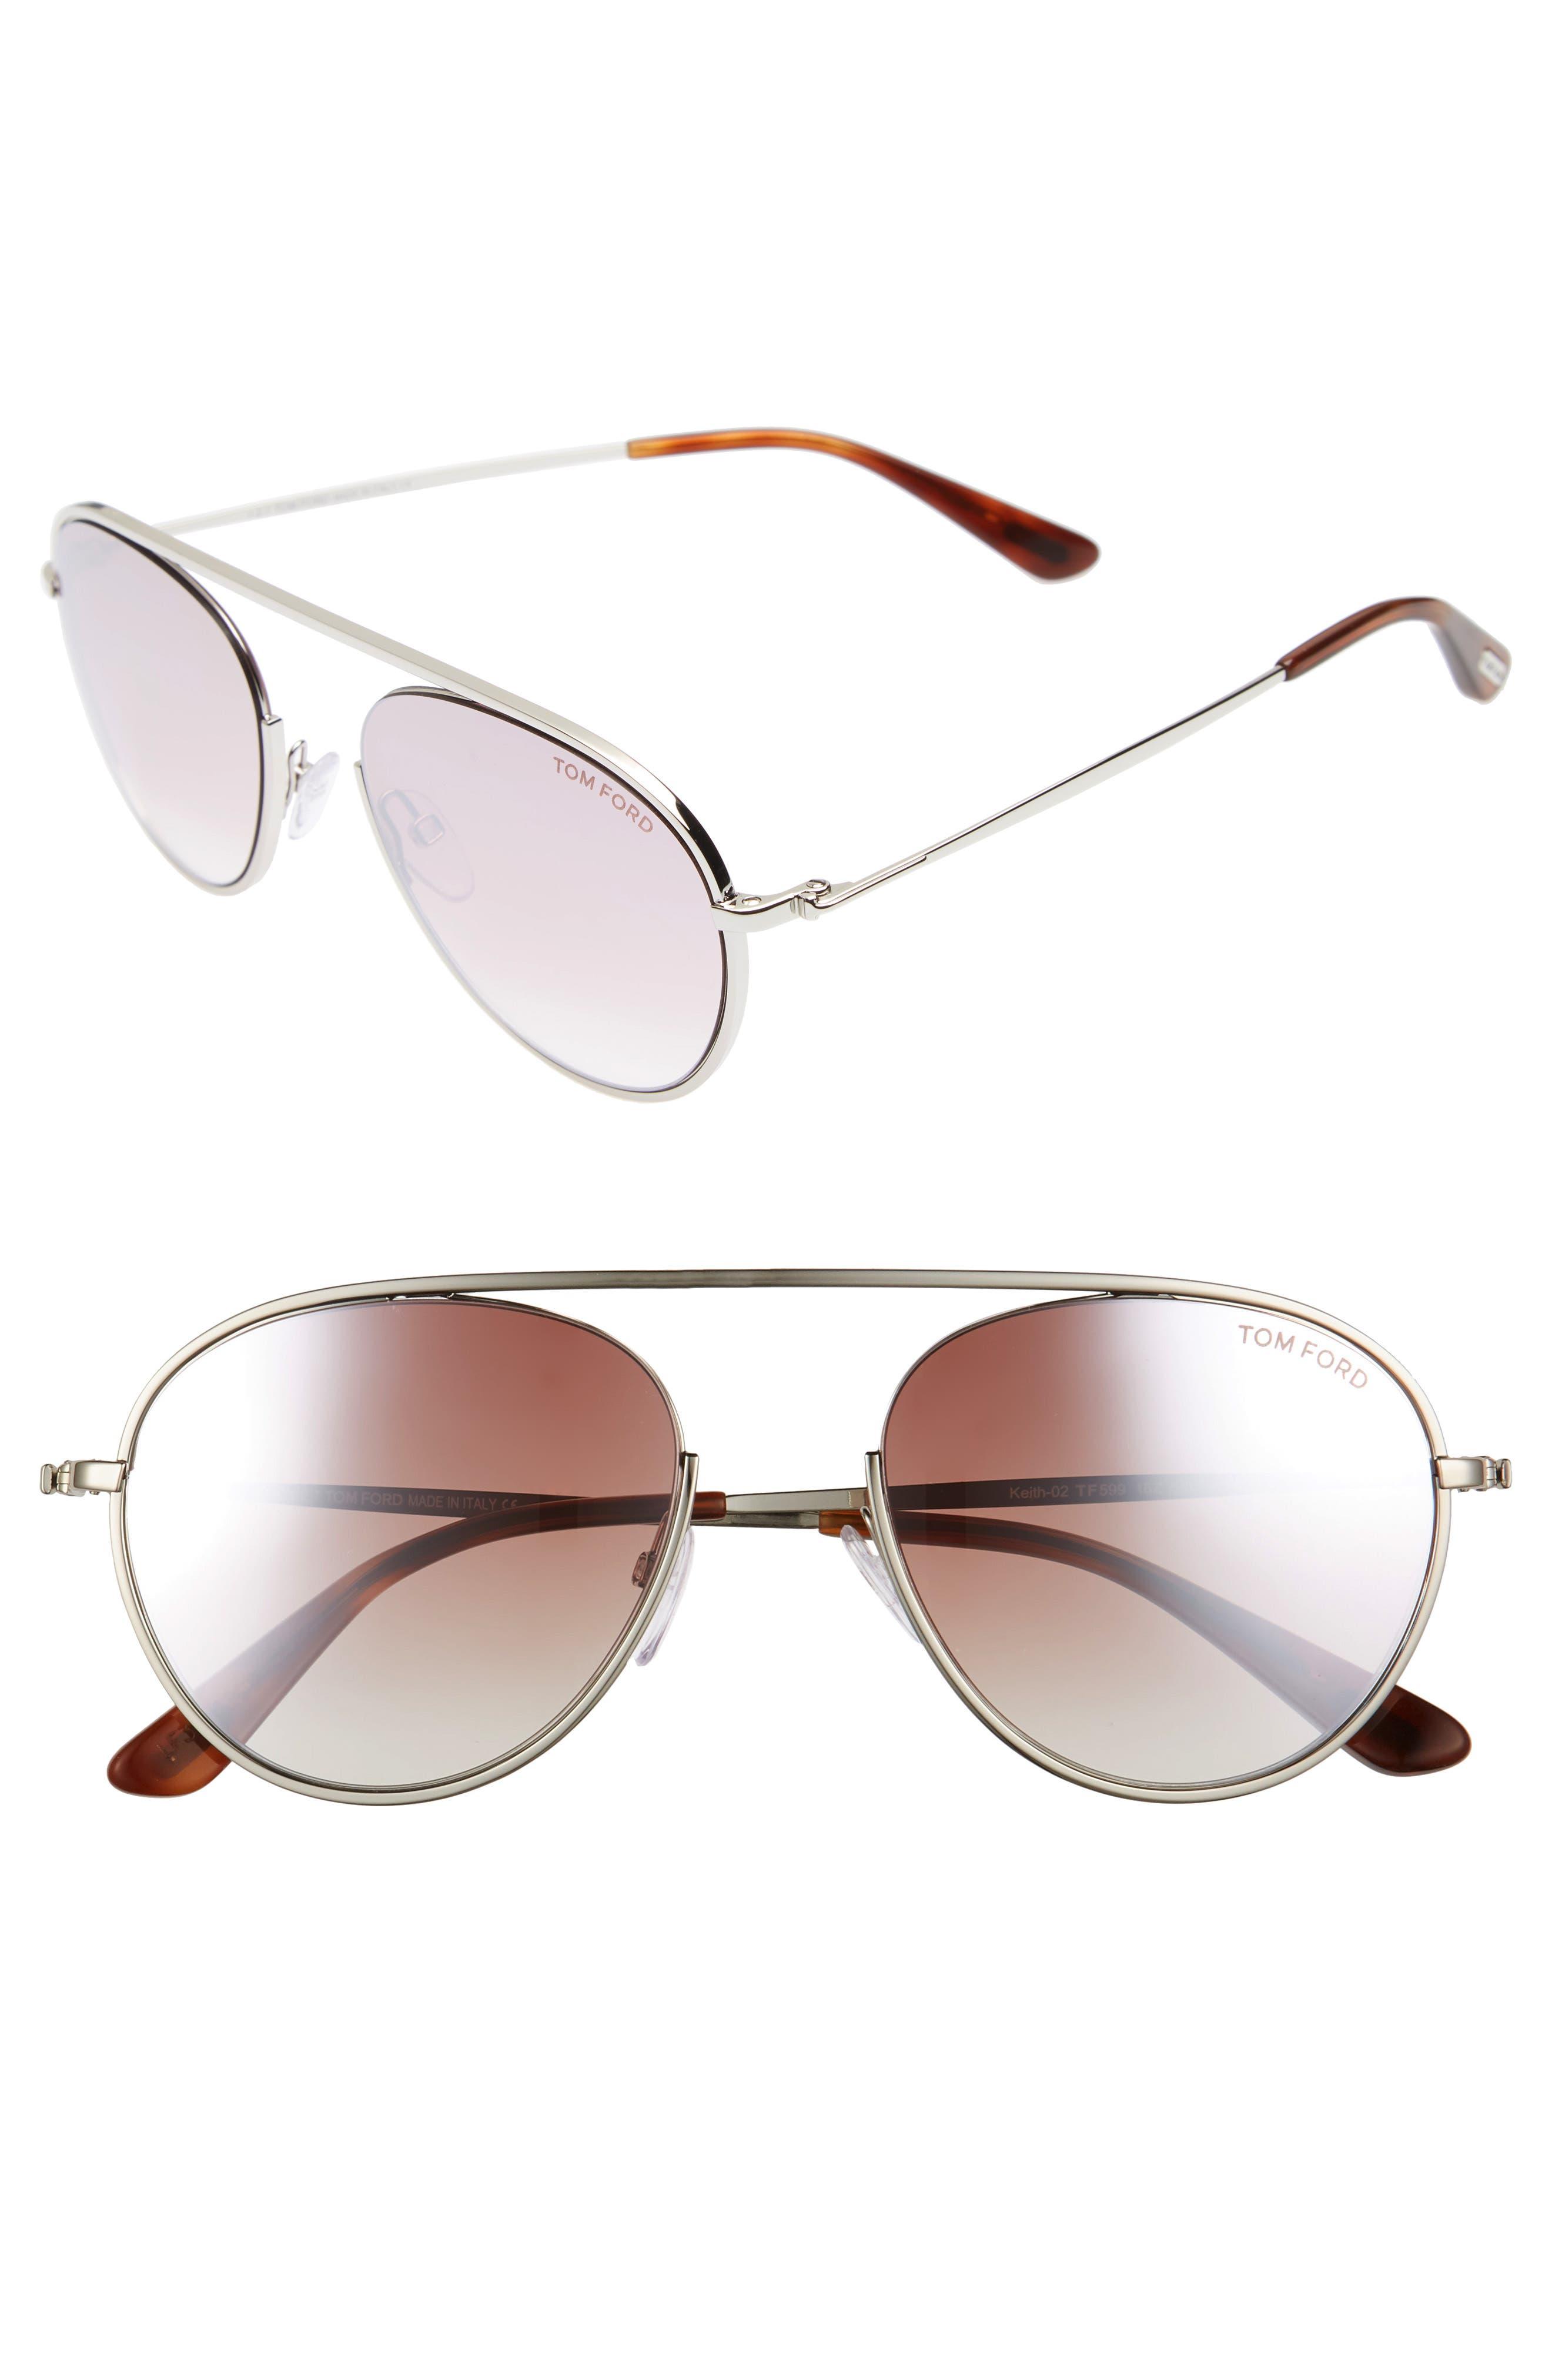 Keith 55mm Metal Aviator Sunglasses,                             Main thumbnail 1, color,                             040